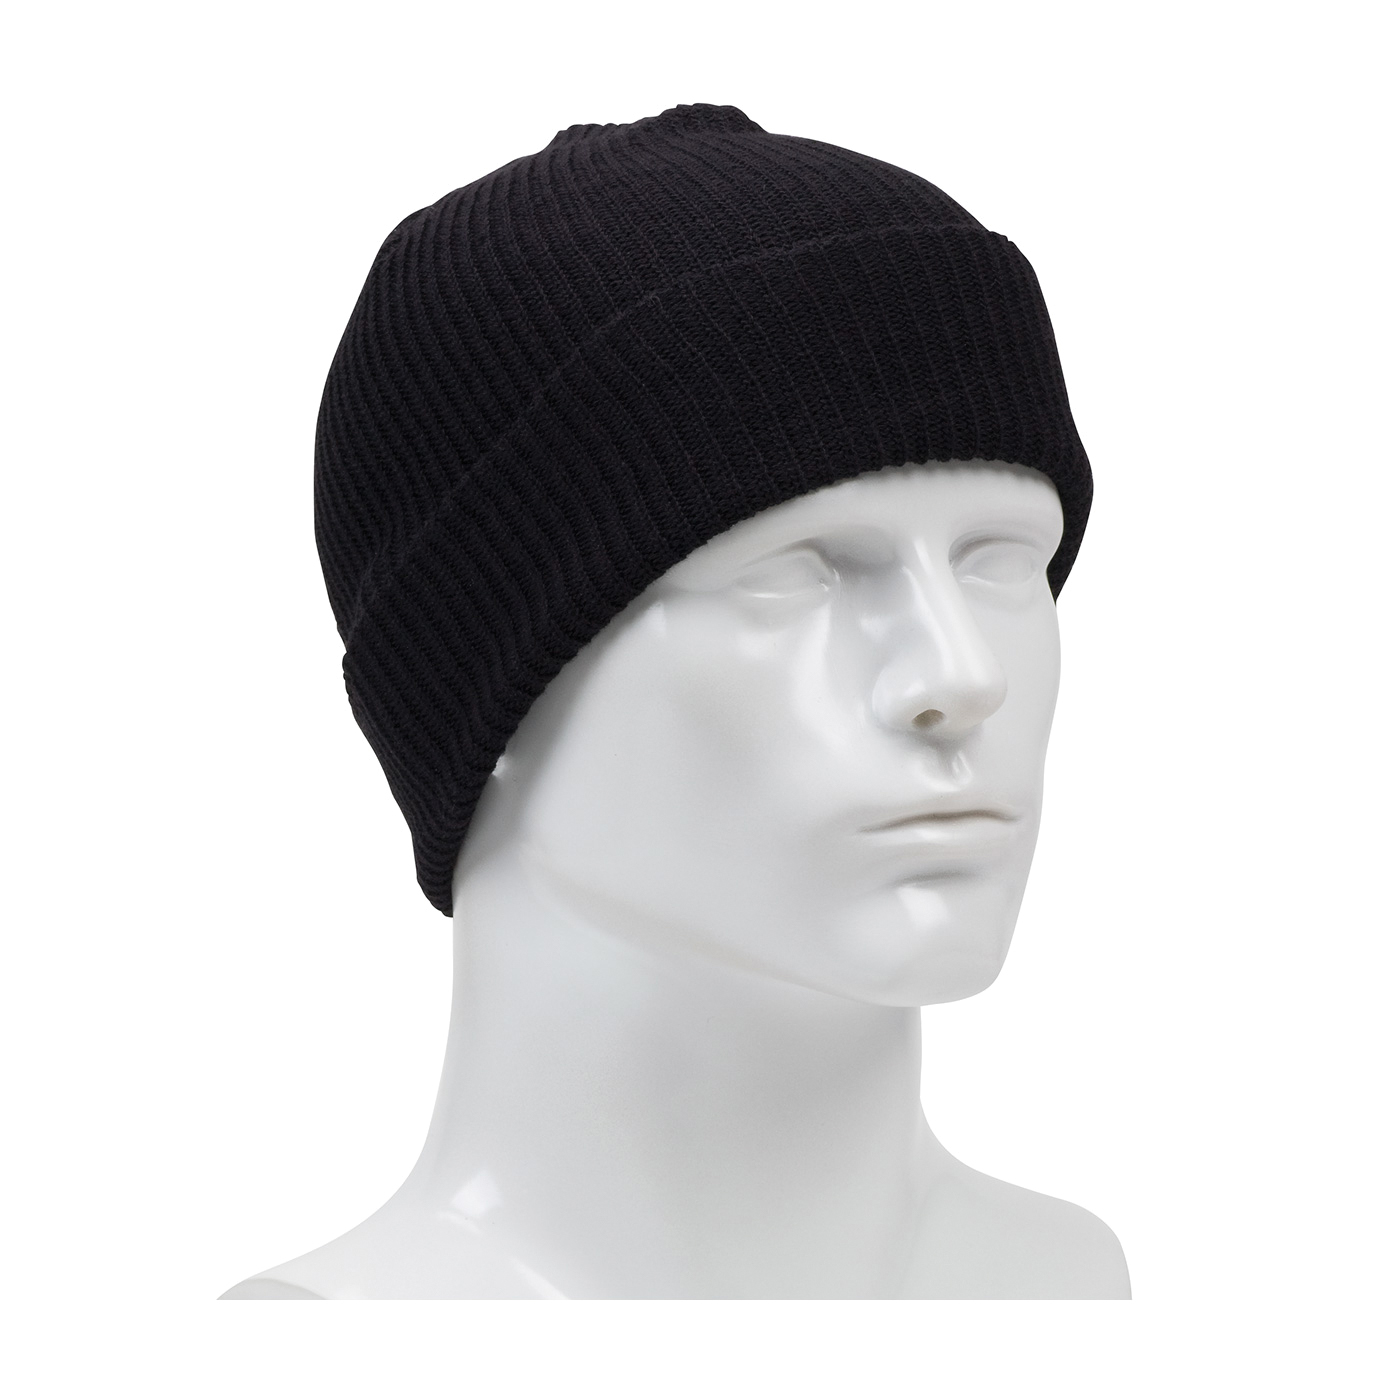 PIP® 360-1500FR-BK 2-Layer Winter Watch Cap, Universal, Black, Rib Knit 60% Modacrylic/40% Cotton